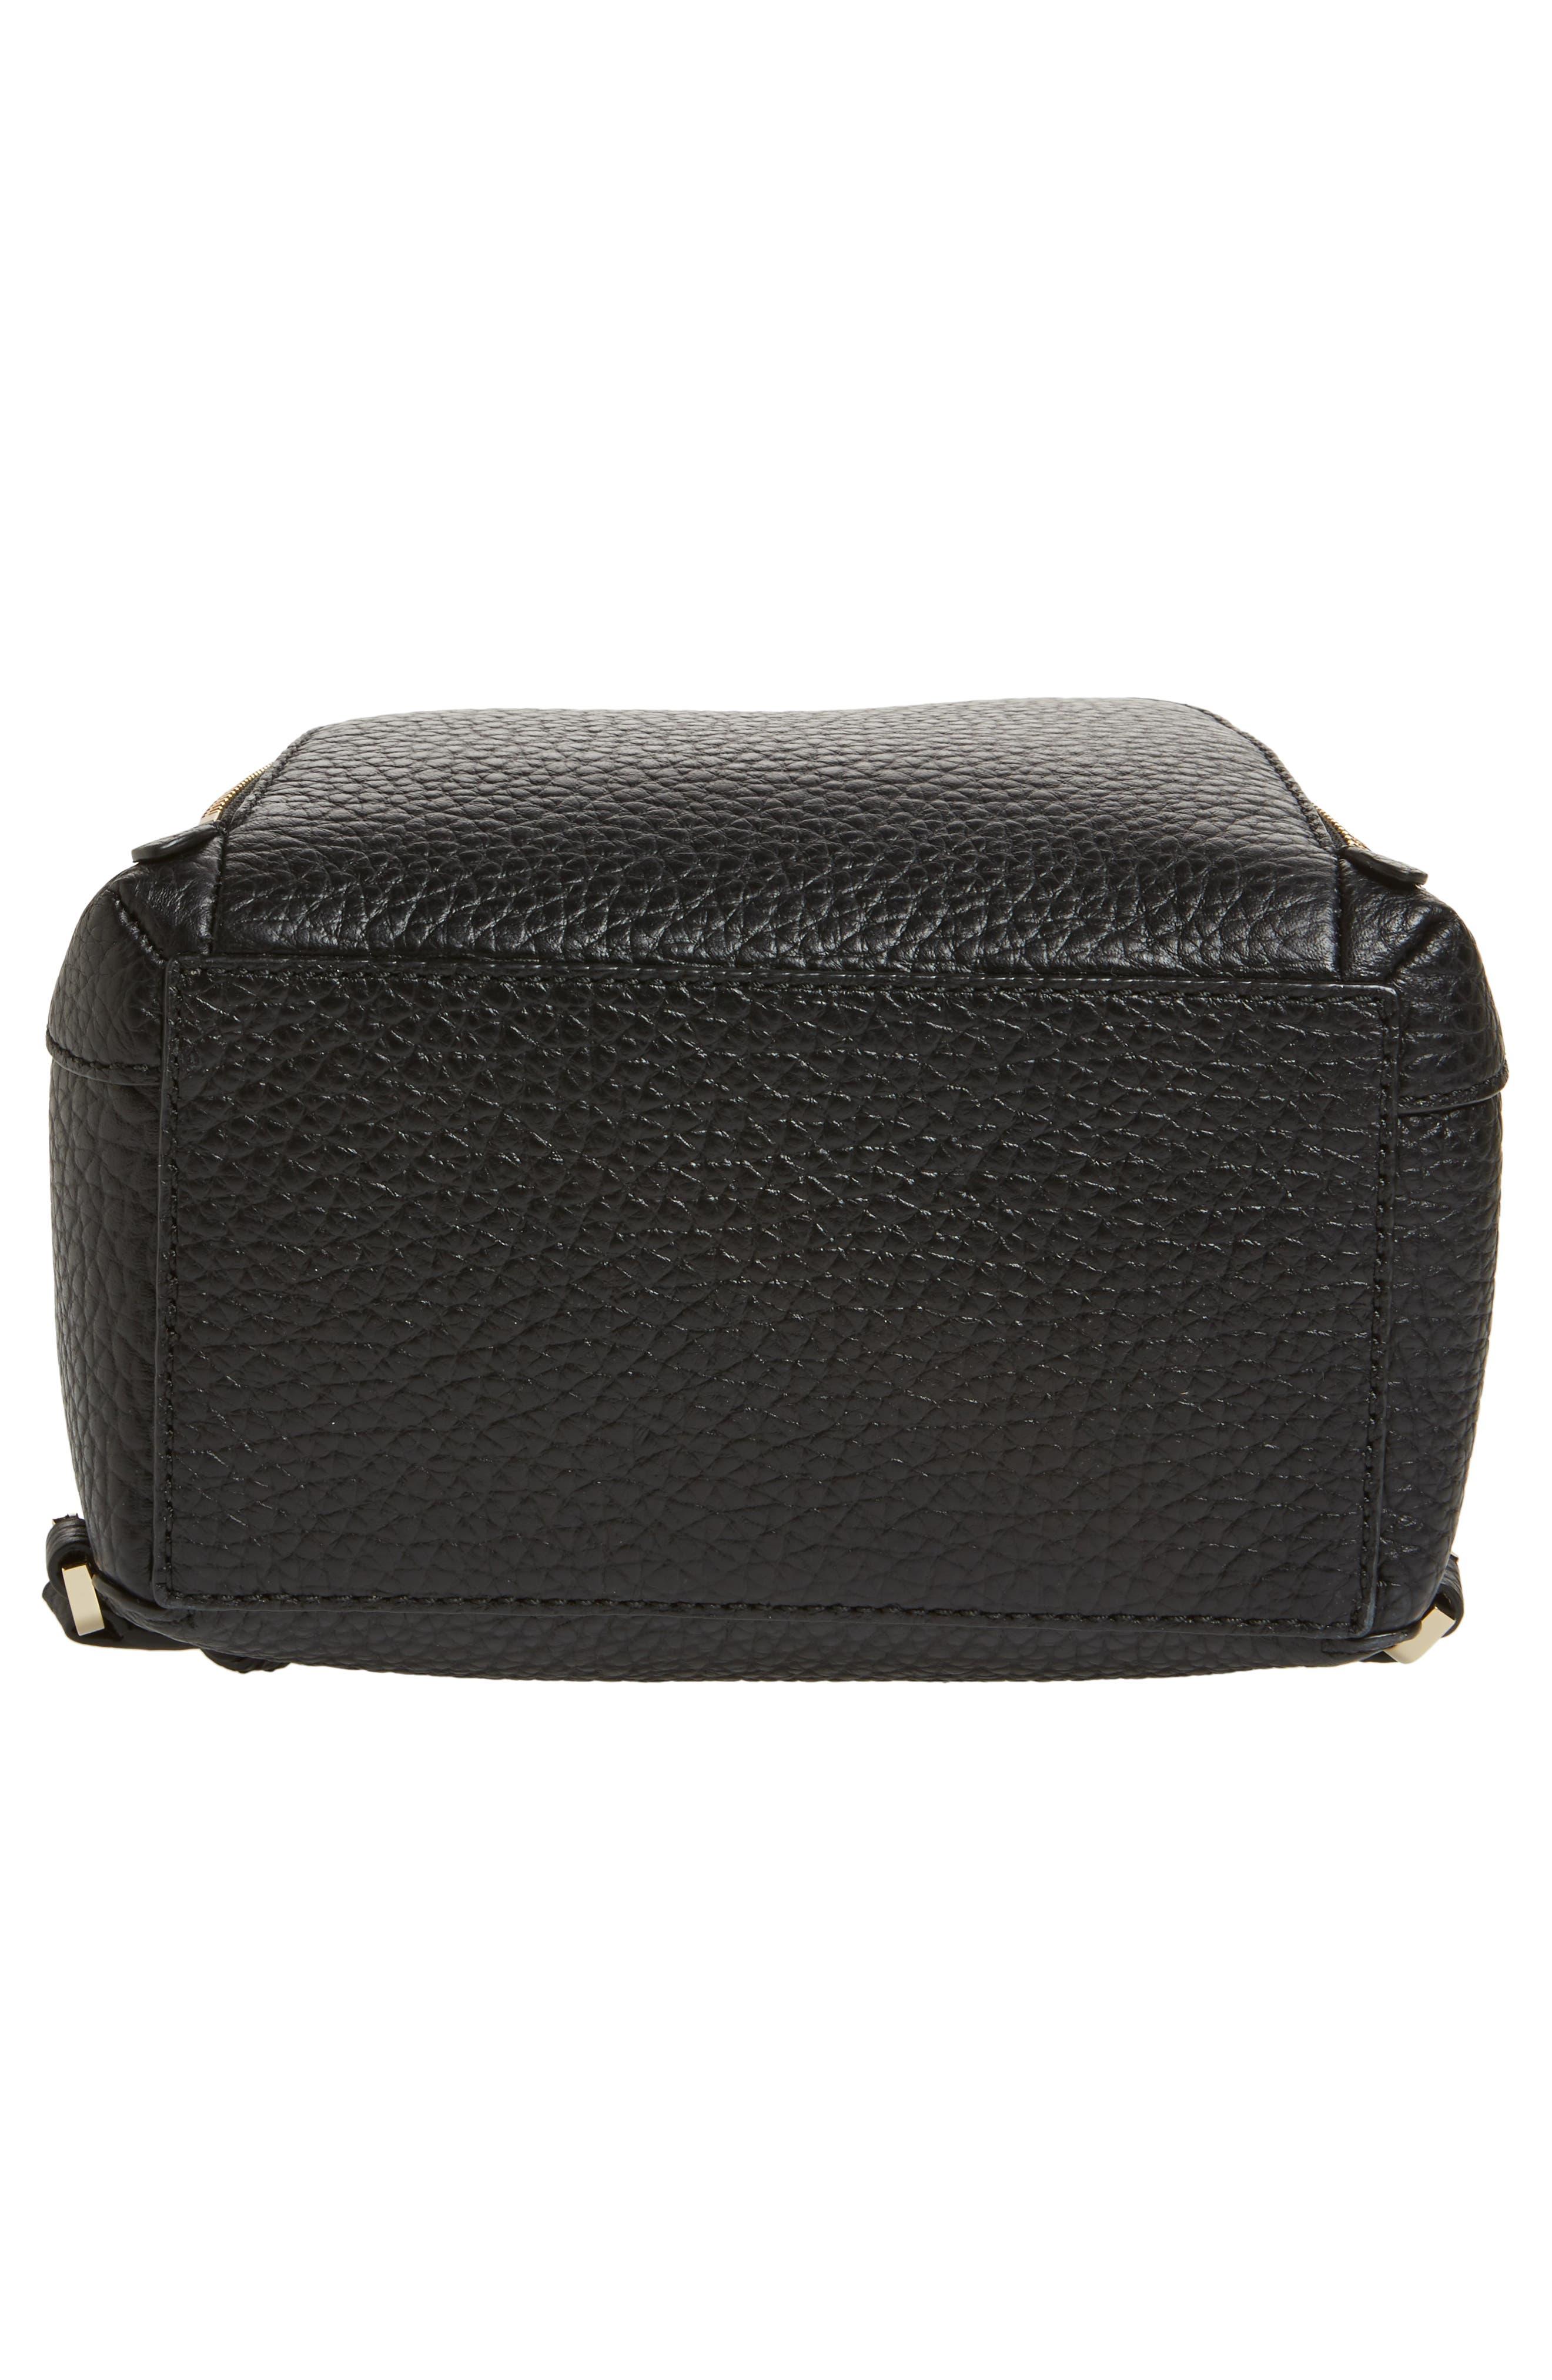 carter street - caden leather backpack,                             Alternate thumbnail 6, color,                             Black